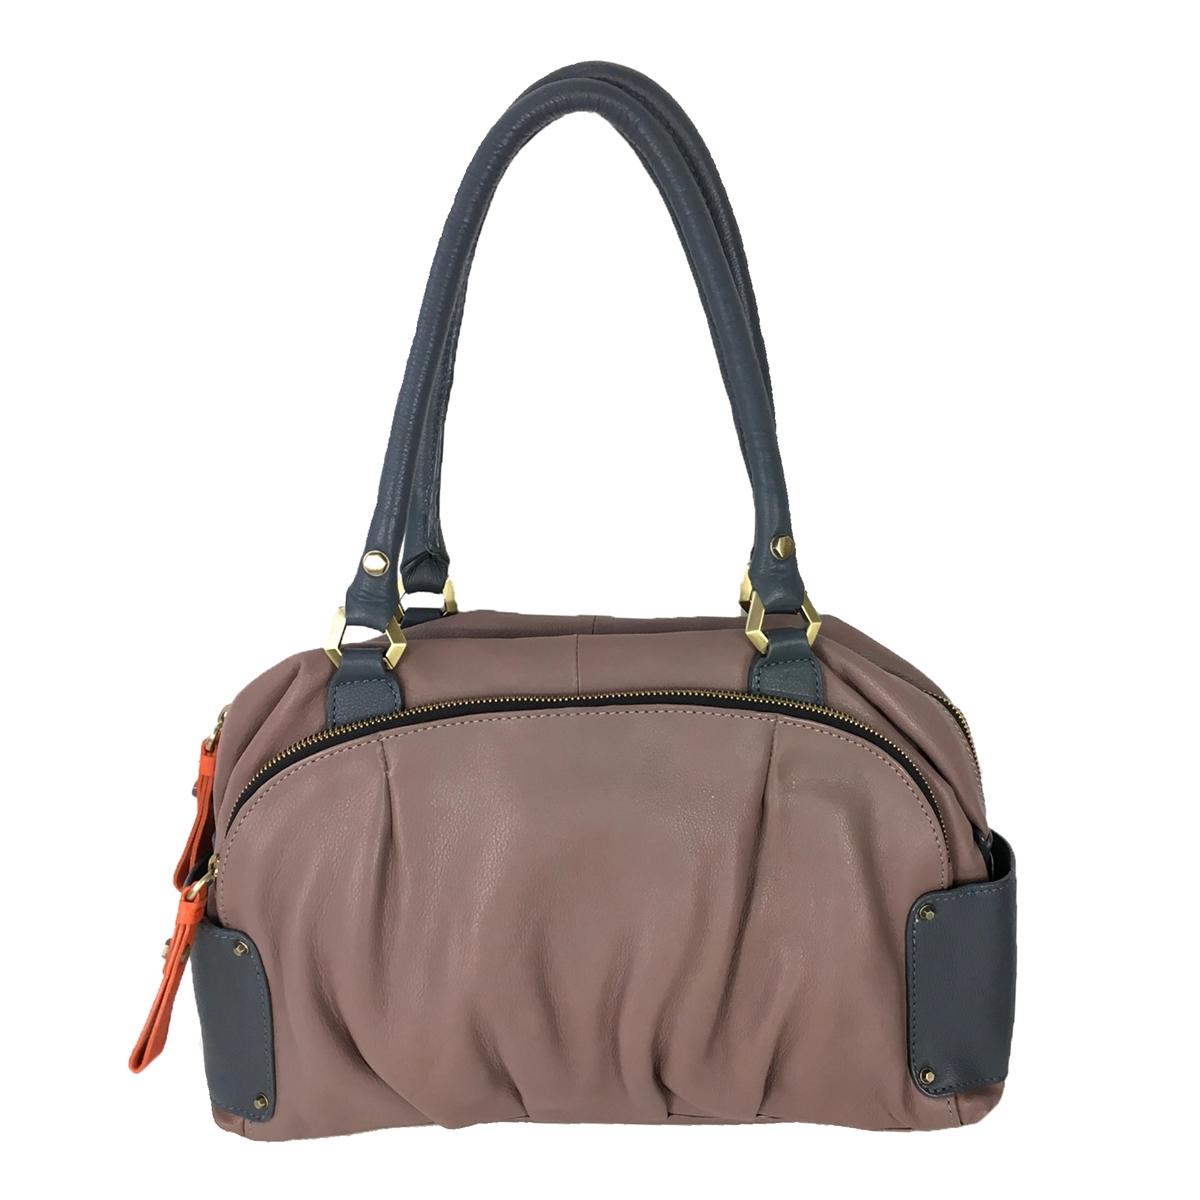 b7ba612cb110 orYANY Tina Leather Satchel Bag, Mushroom Taupe